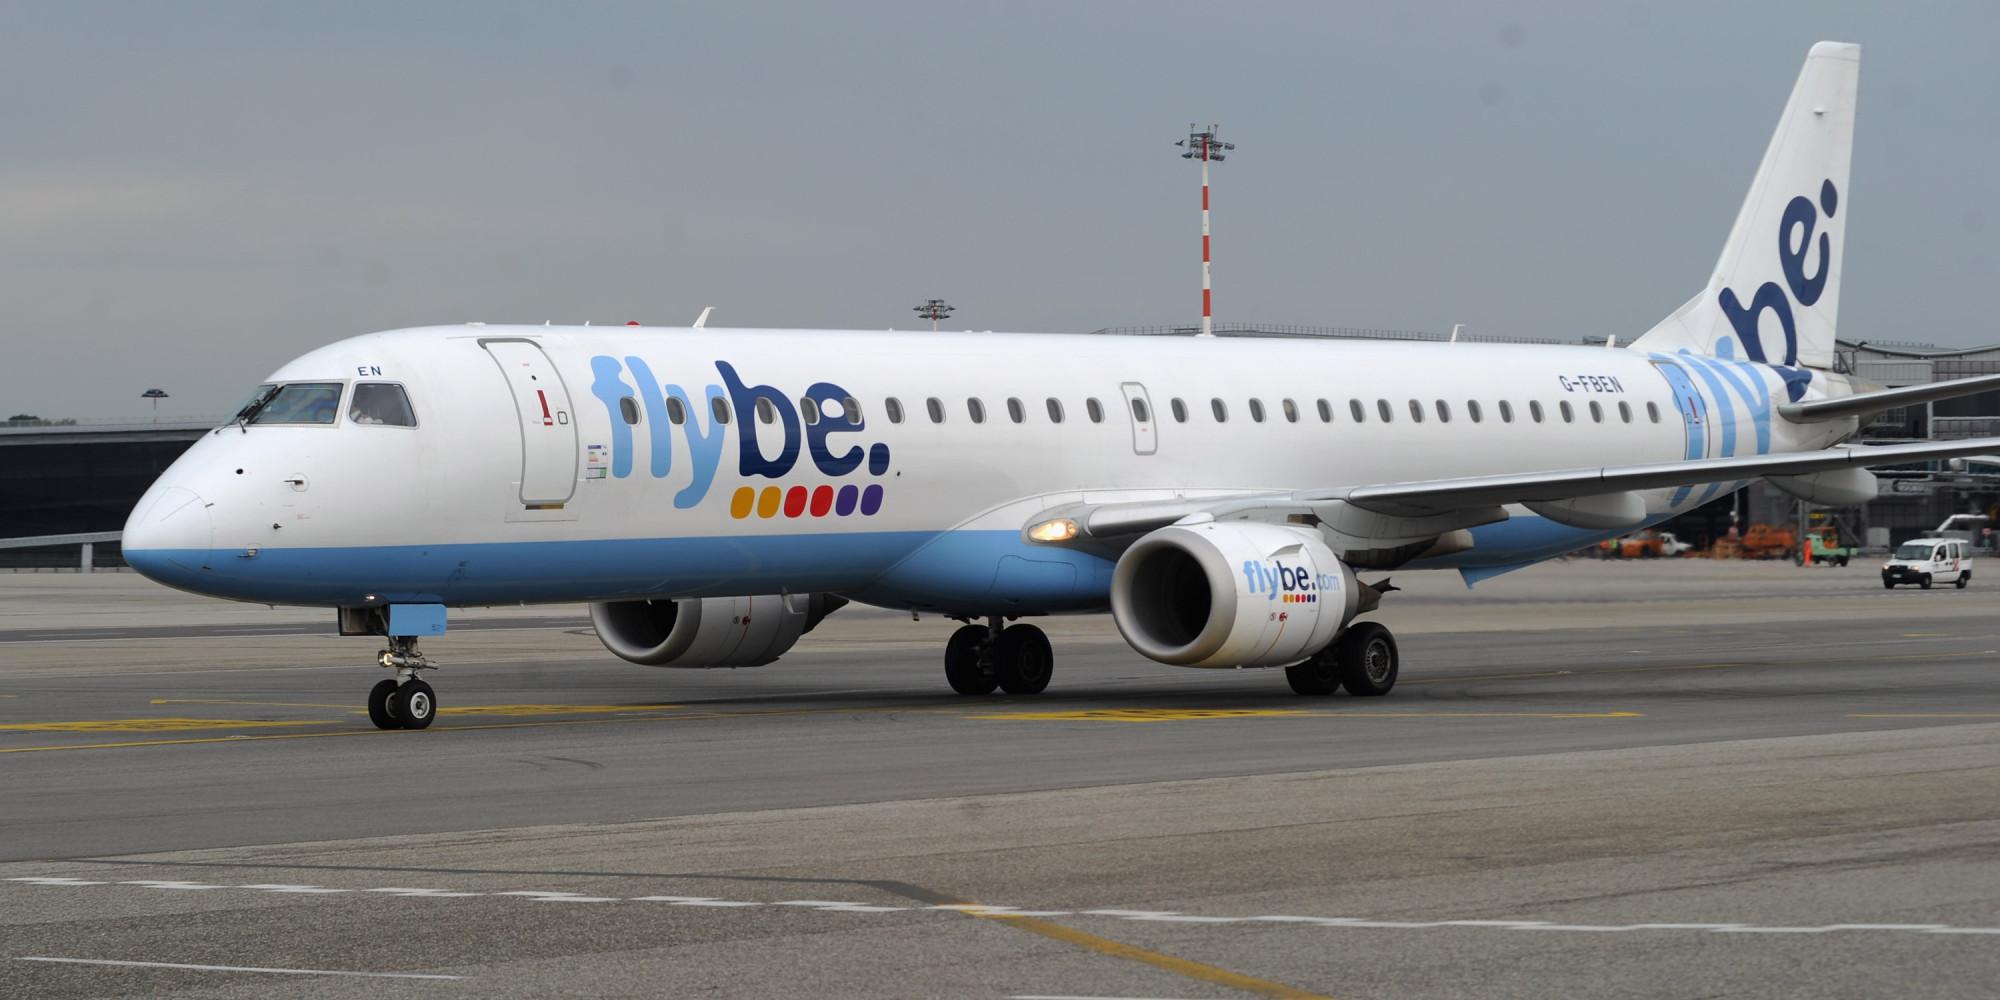 flybe - photo #9